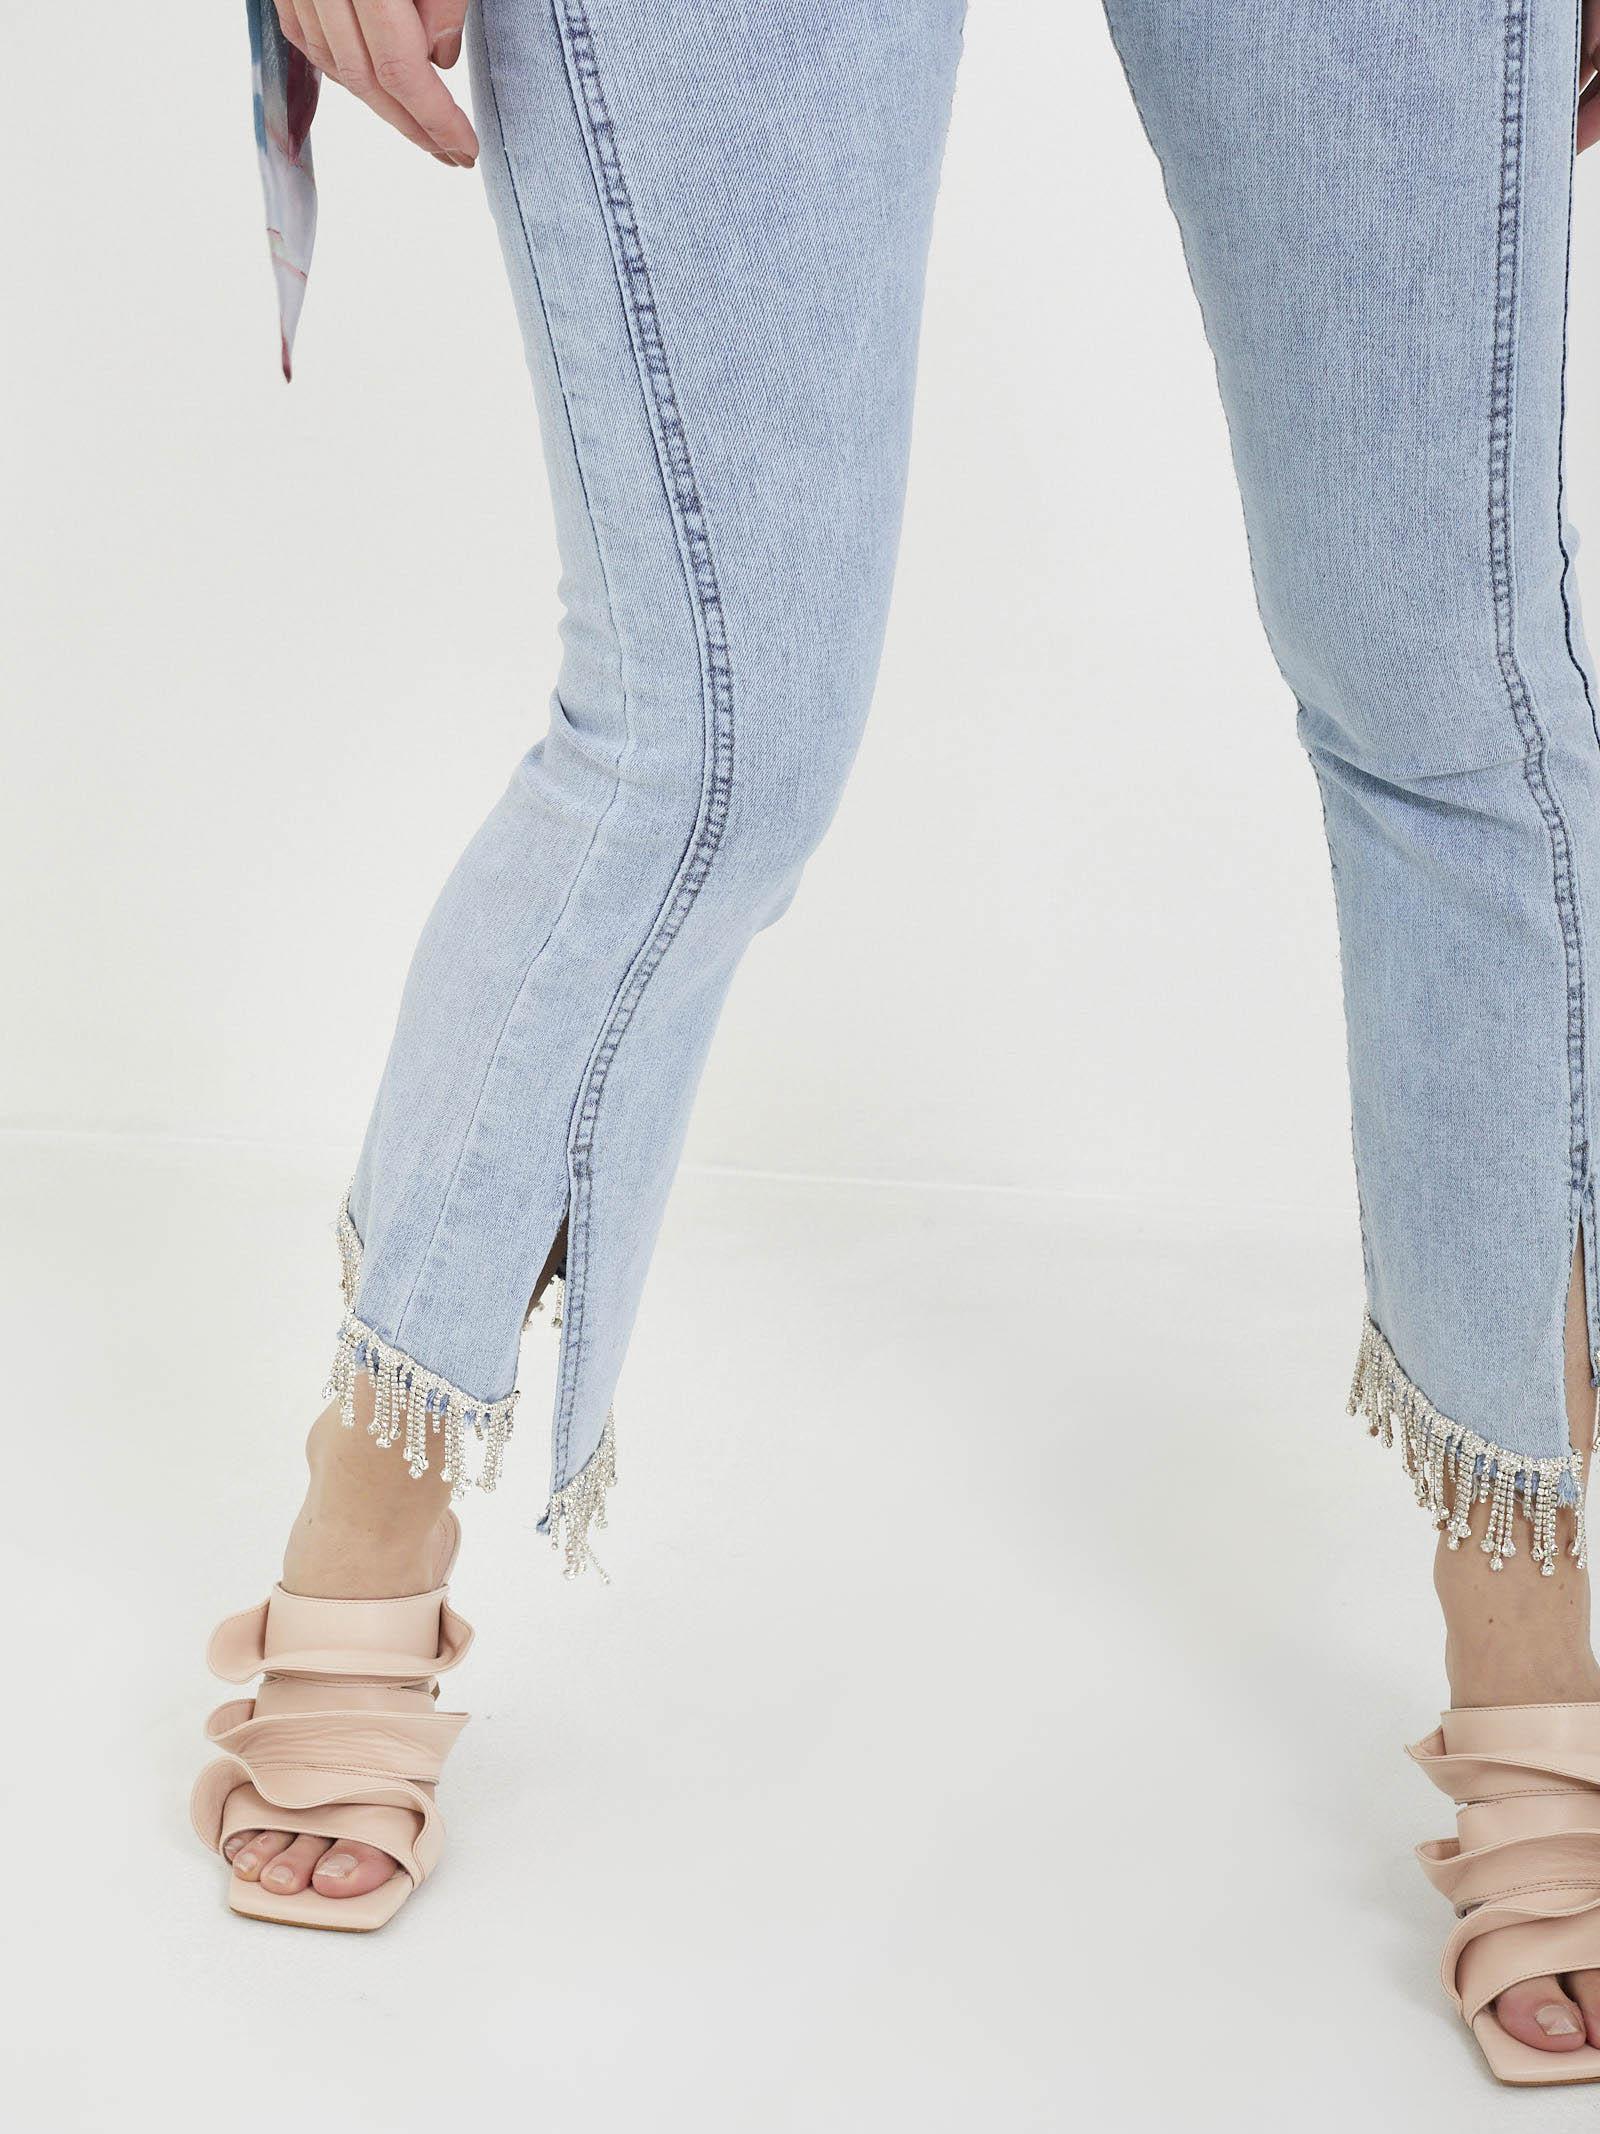 Jeans ODI ODI | Jeans | RAQUEL JEANSJEANS